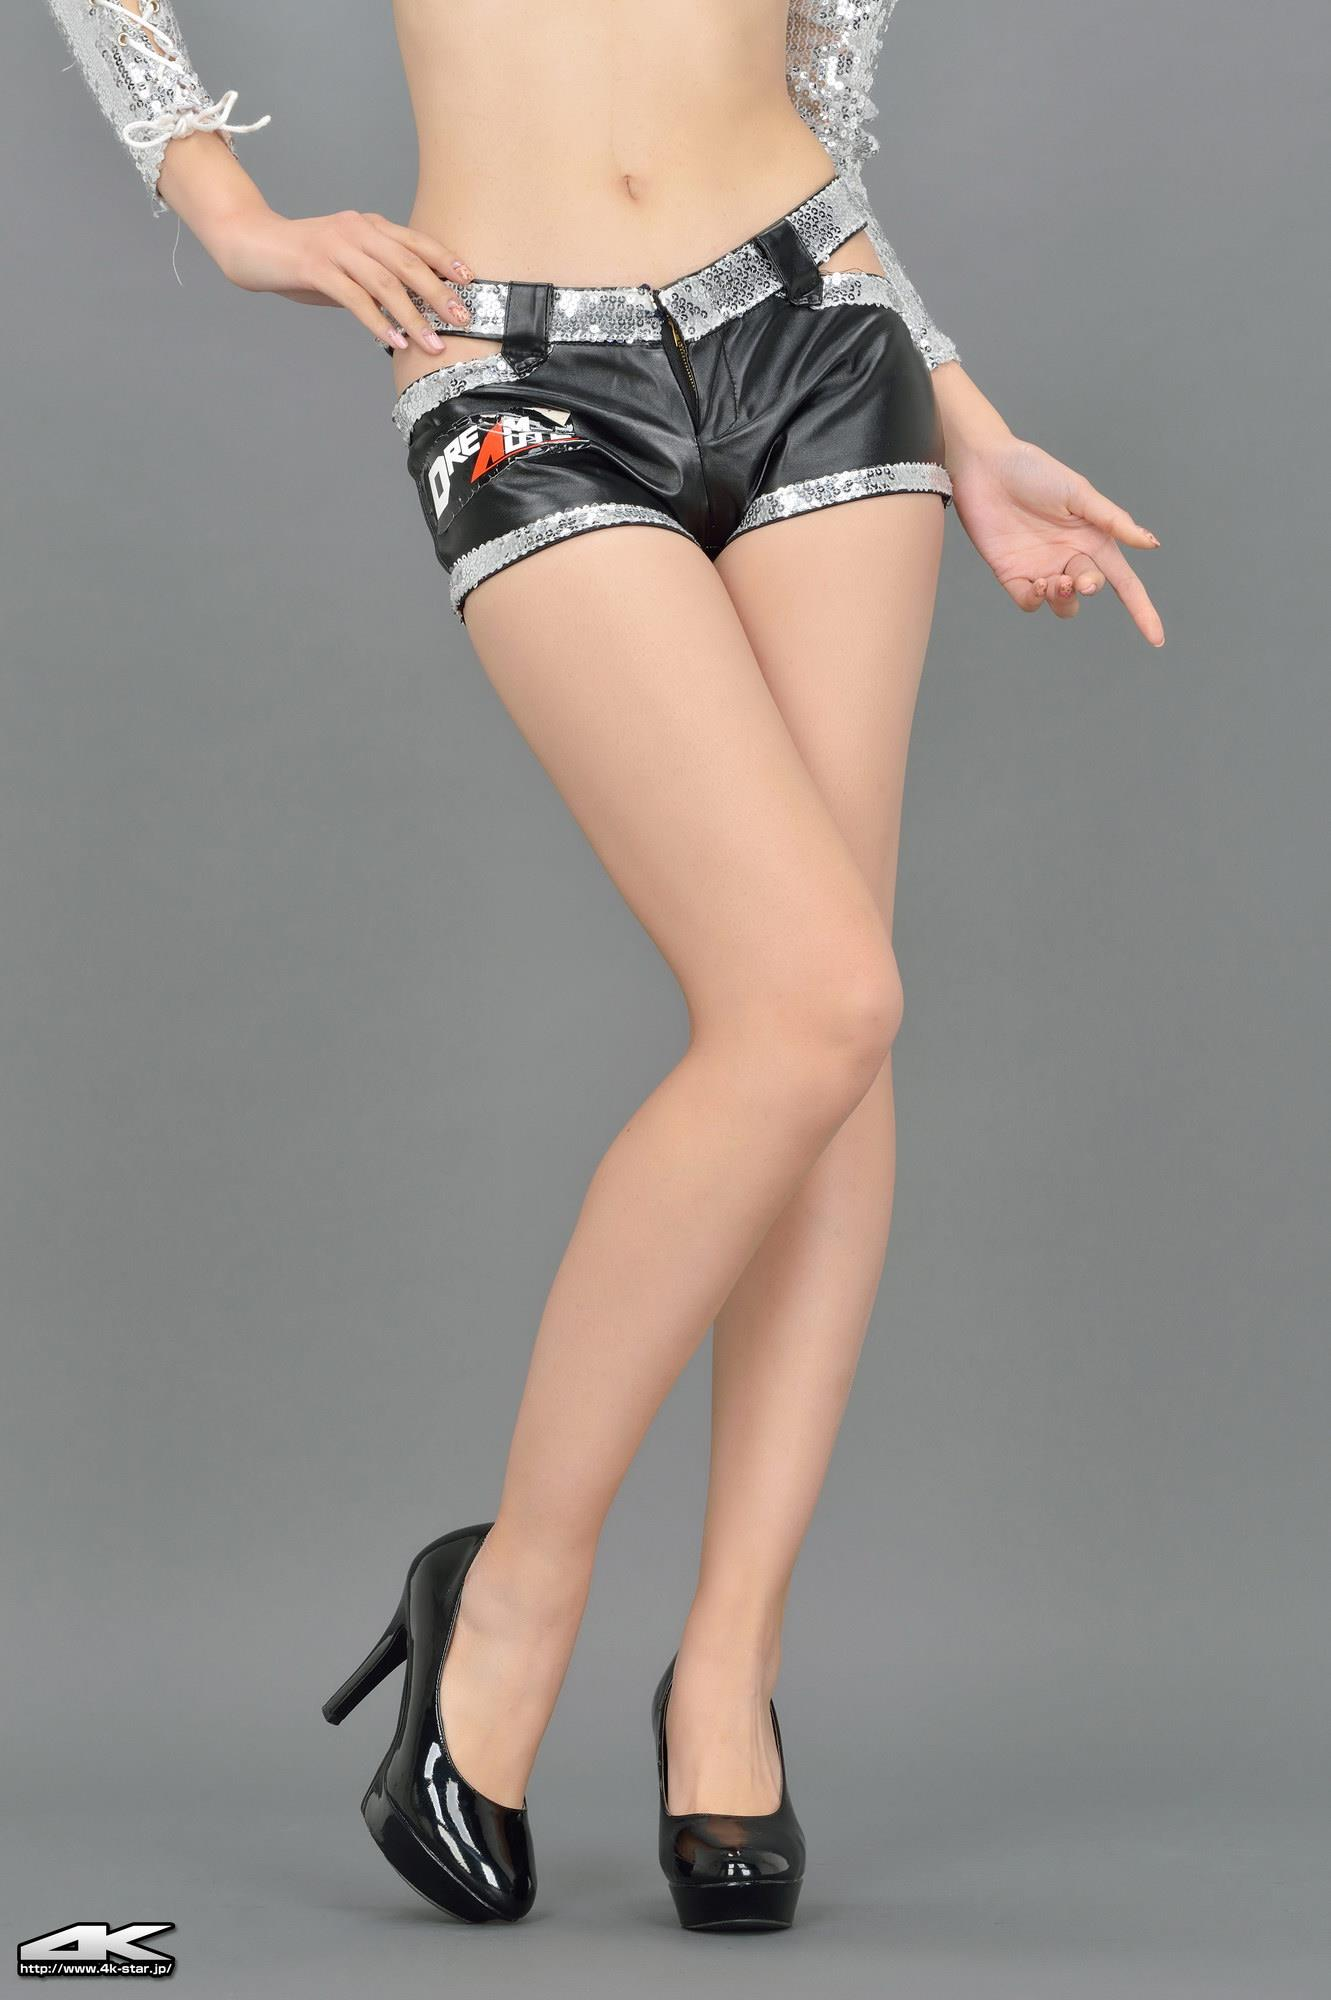 [4K-STAR套图]No.00112 真先由紀奈,Masaki Yukina 银色闪亮内衣加黑色性感皮短裤私房写真集